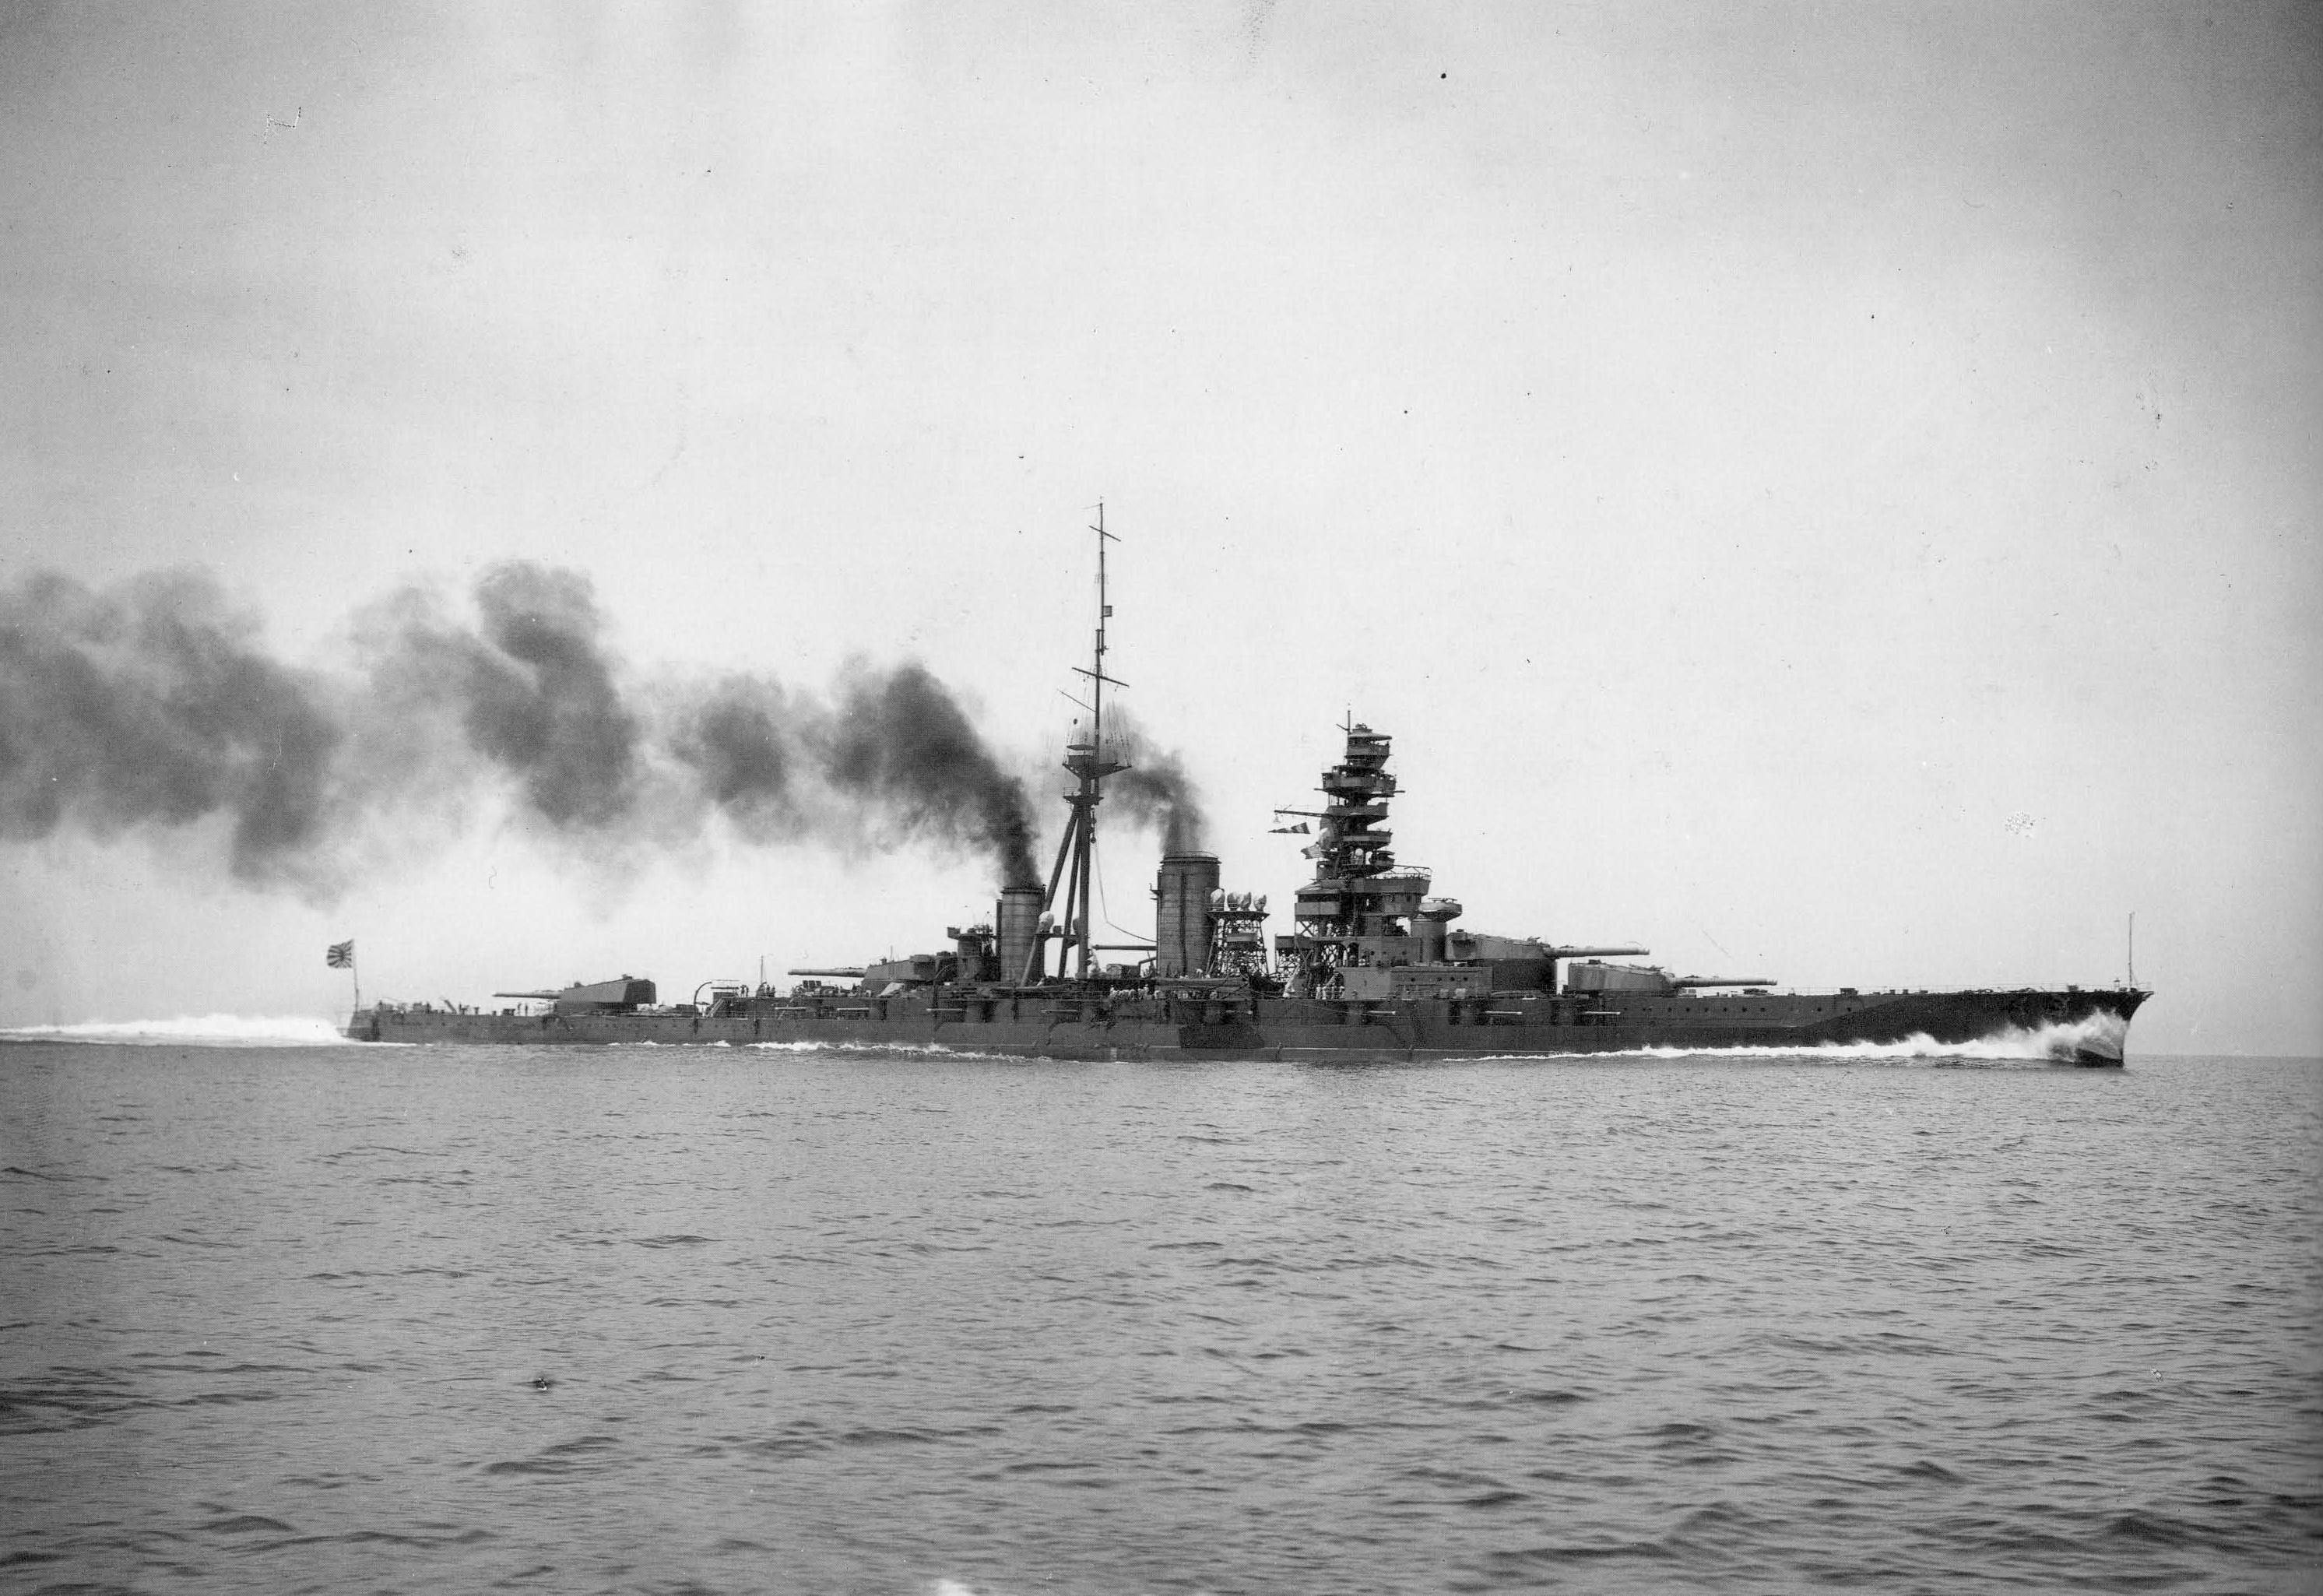 Imperial Japanese Navy battleship Haruna undergoes trials after reconfiguration from a battlecruiser to a battleship.